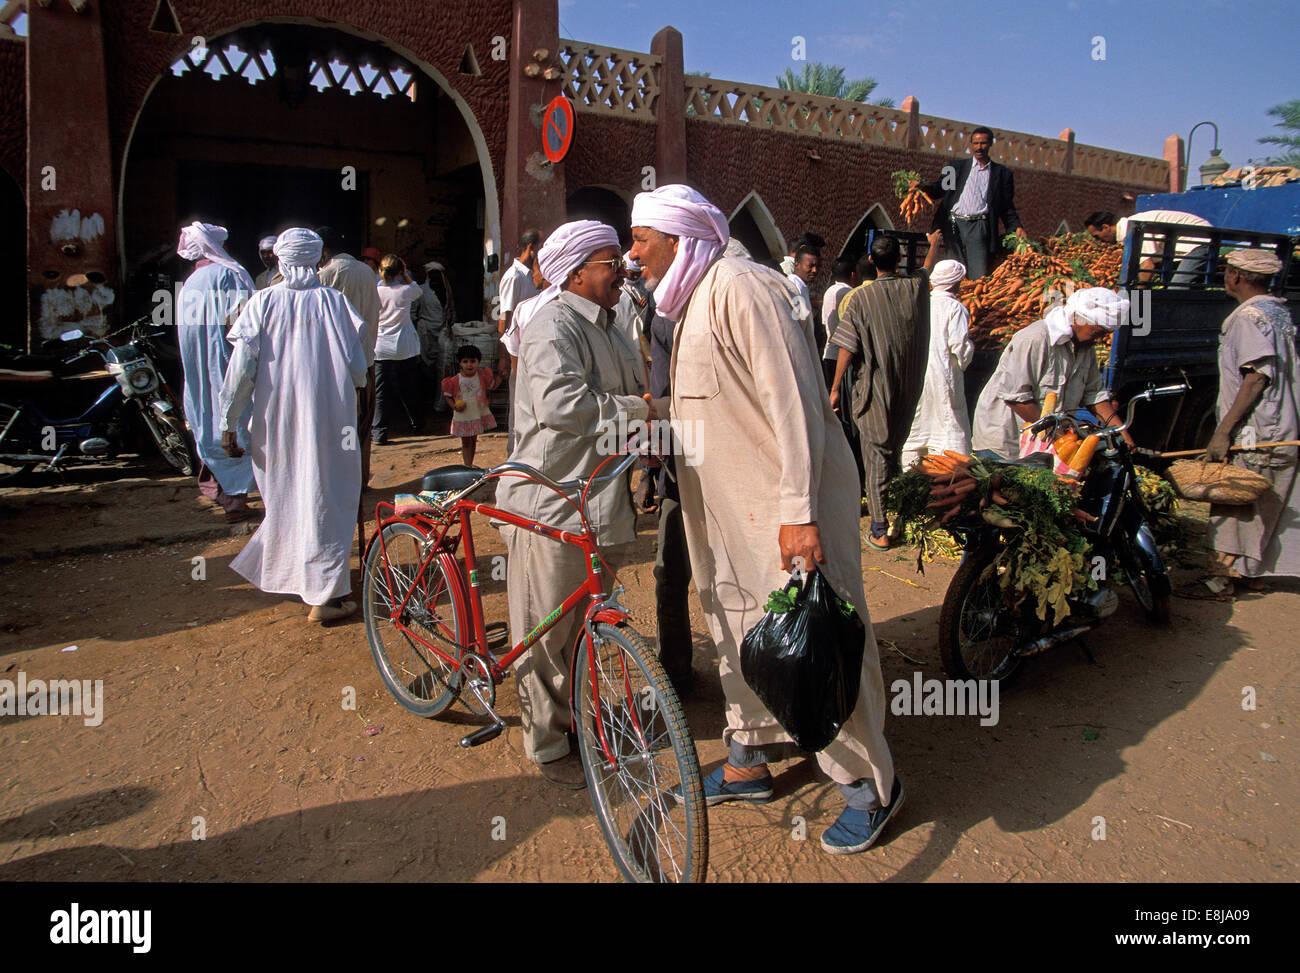 Tuareg population of Timimoun in Algeria. Shops in a market. - Stock Image